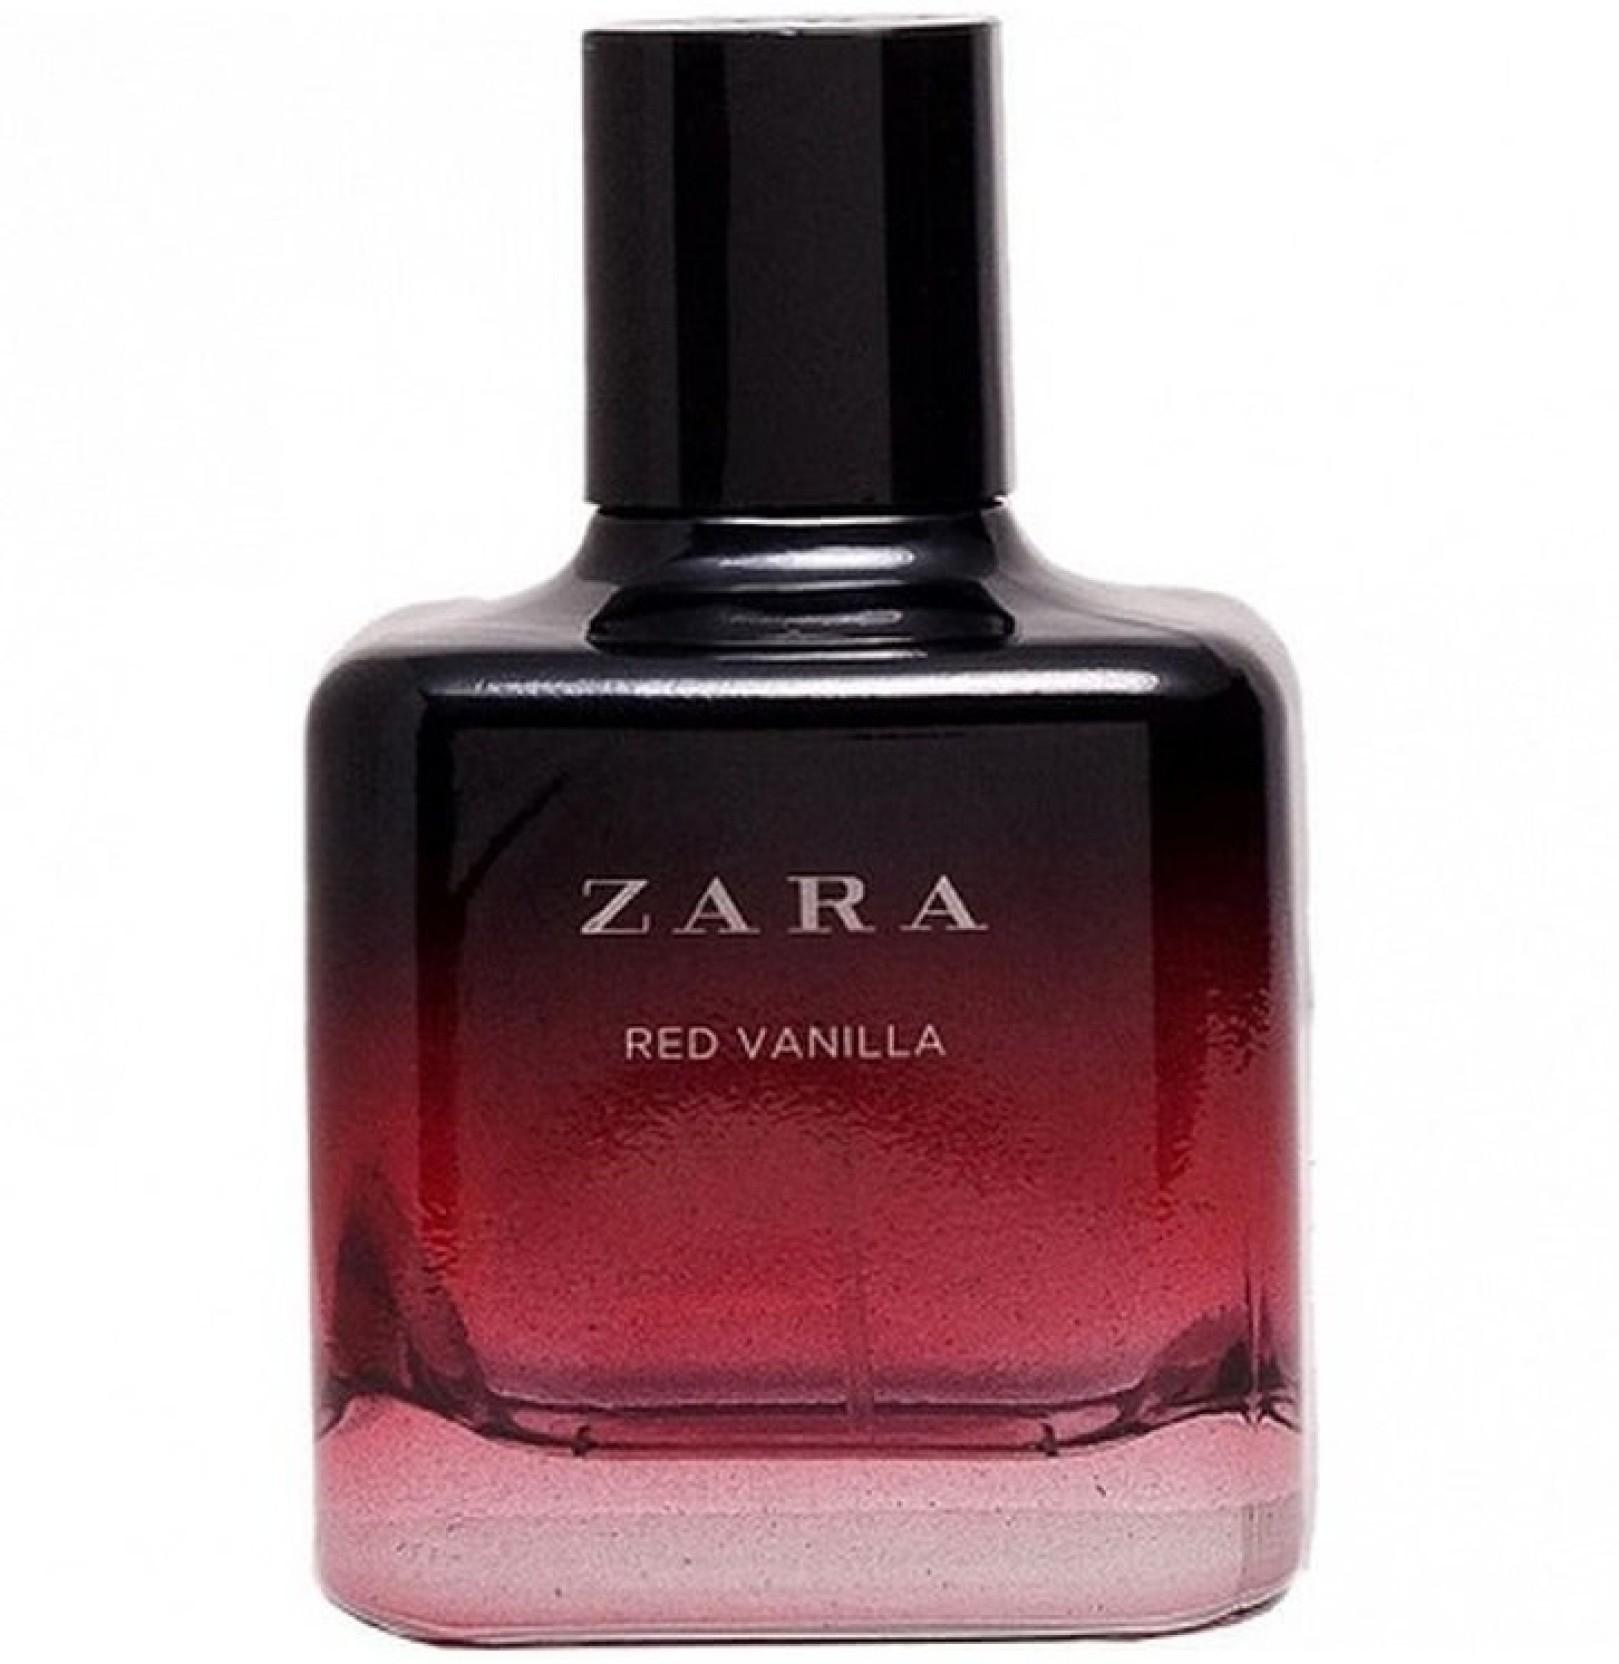 Buy Zara Red Vanilla 100 Original Unboxed Eau De Toilette 100